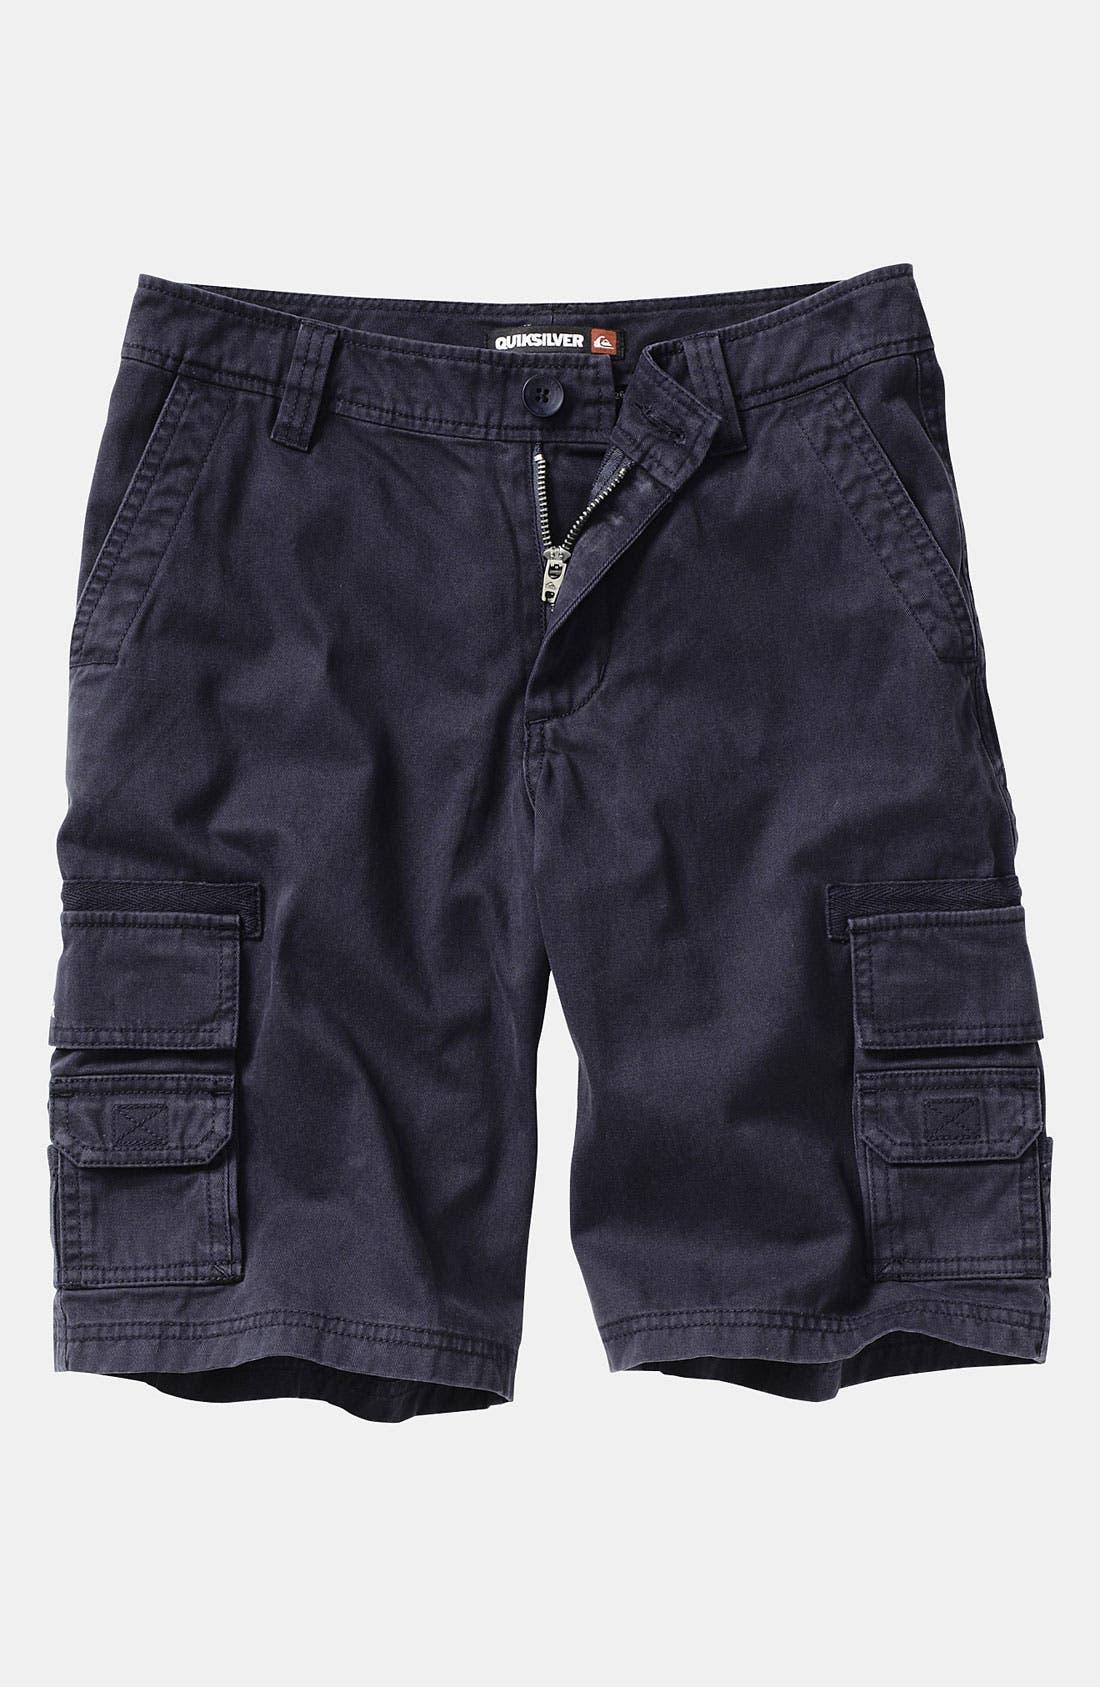 Main Image - Quiksilver 'Escargot' Cargo Shorts (Infant)